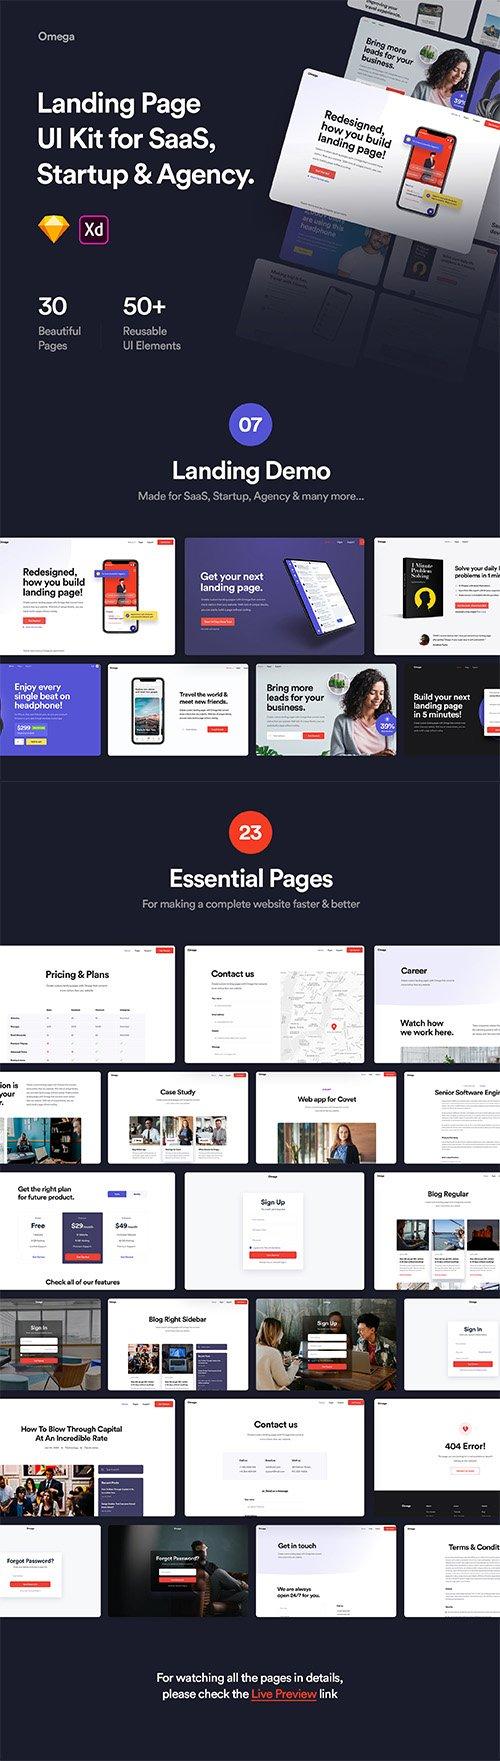 Omega - Landing Page Design Template